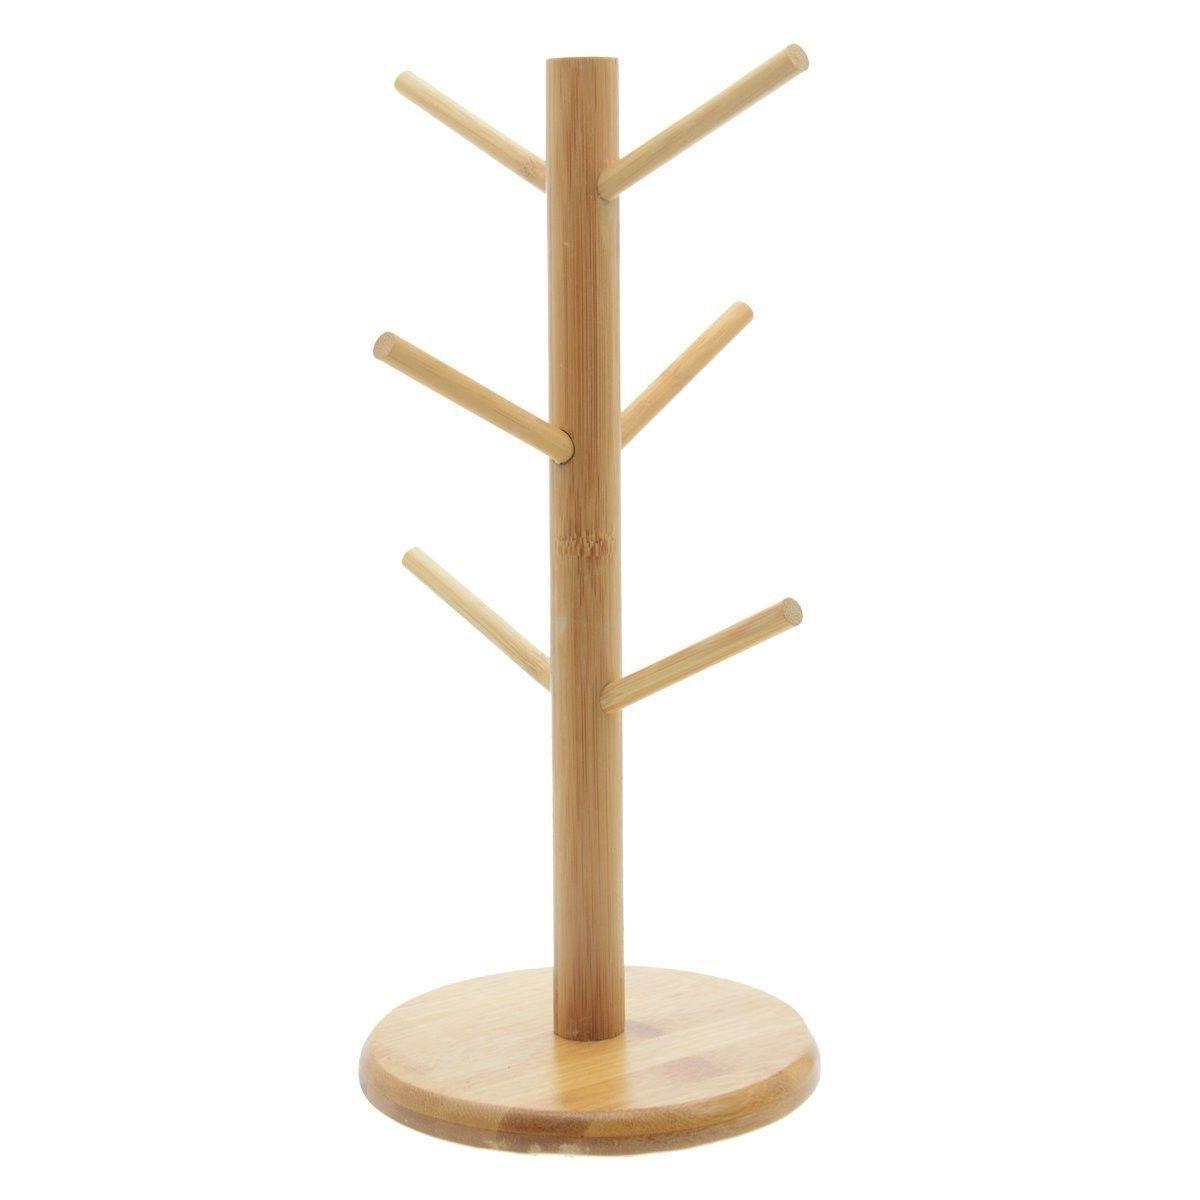 Mug Tree Stand Coffee Tea Cup Holder Kitchen Hanger Display